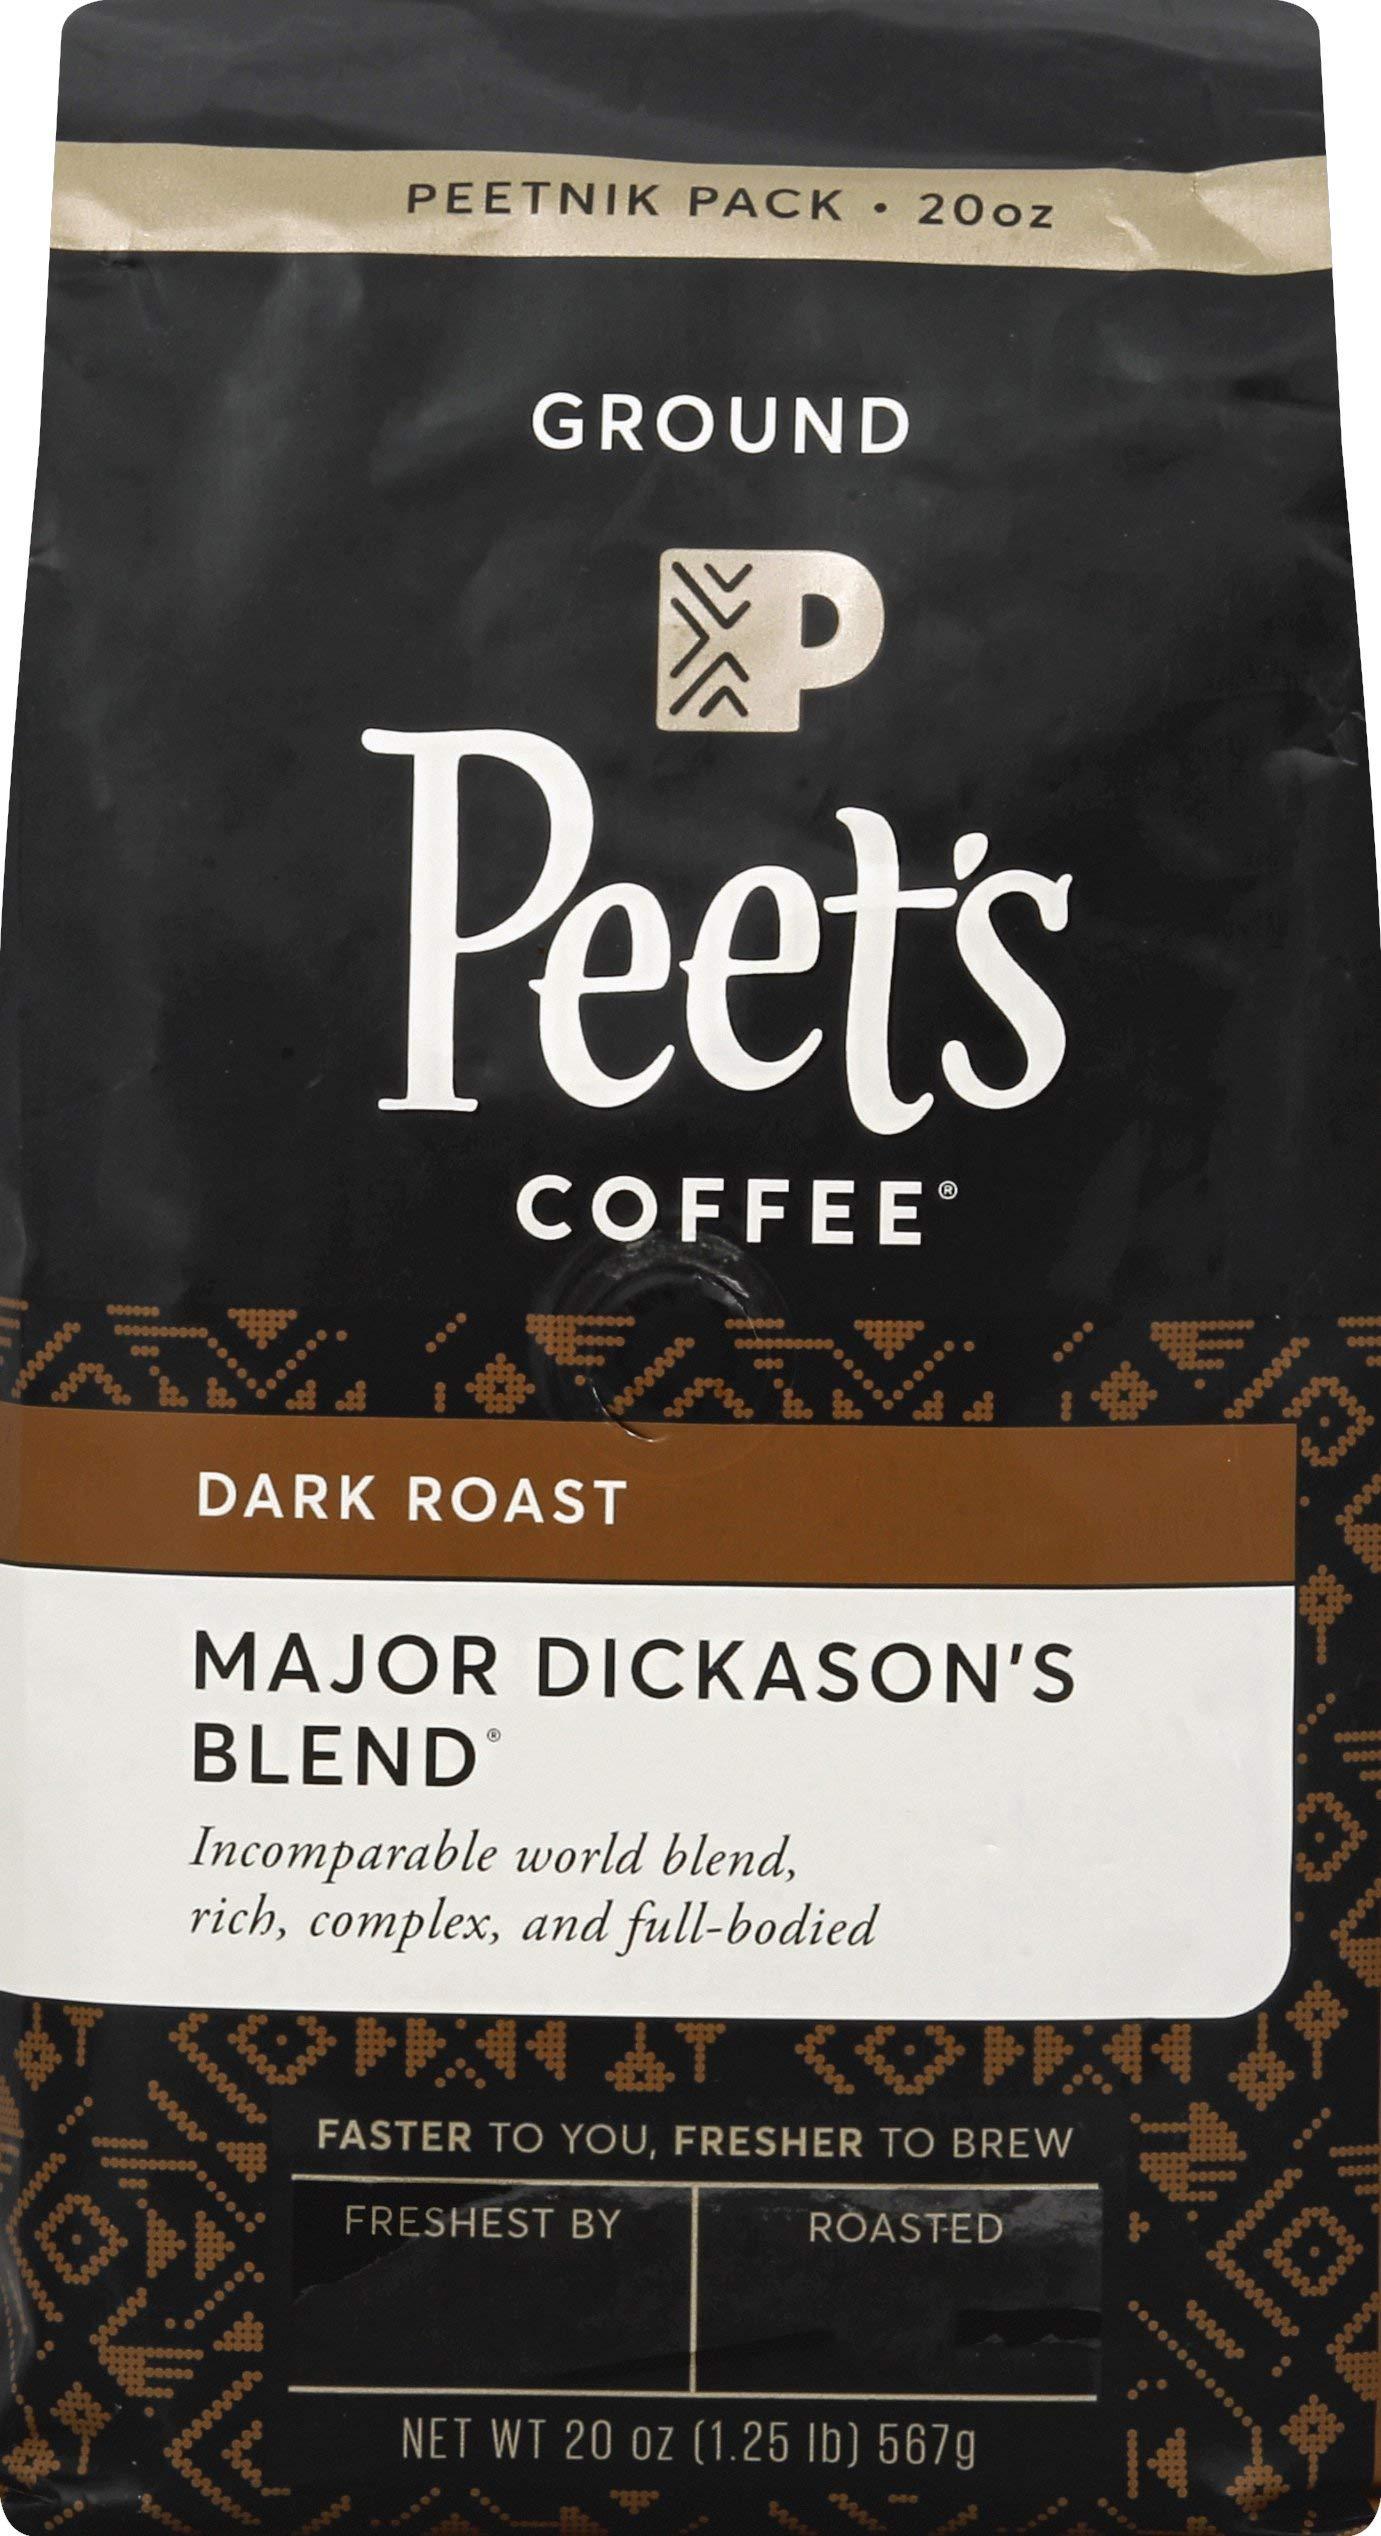 Peet's Coffee Major Dickason's Blend, Dark Roast Ground Coffee, 20 Ounce Peetnik Pack by Peet's Coffee